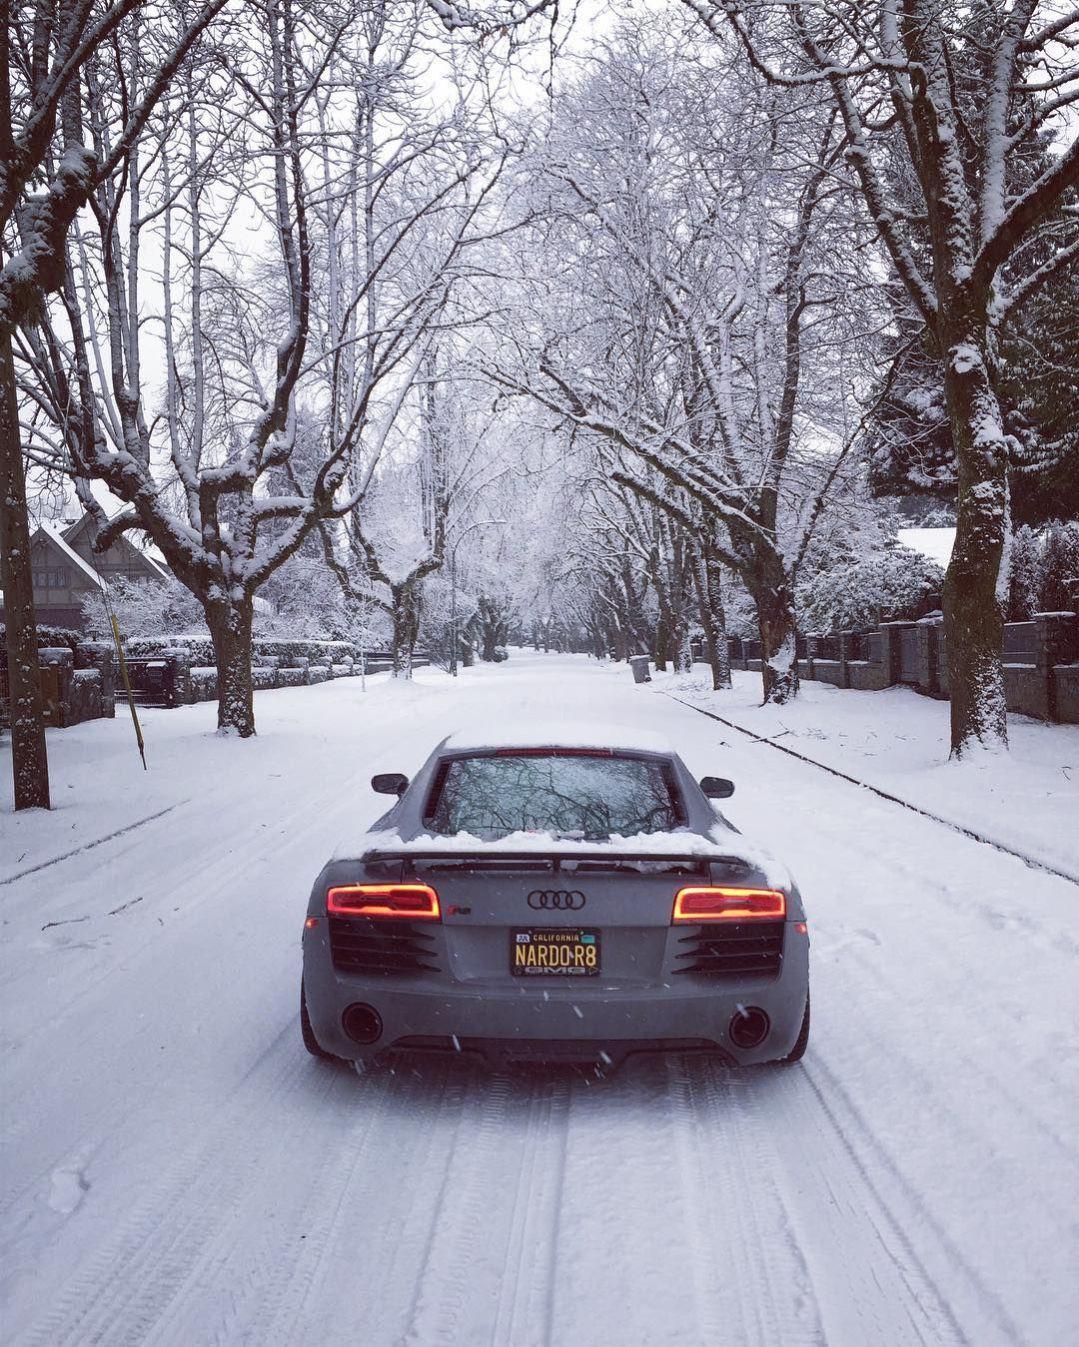 A good sled. NardoGrey Audi R8